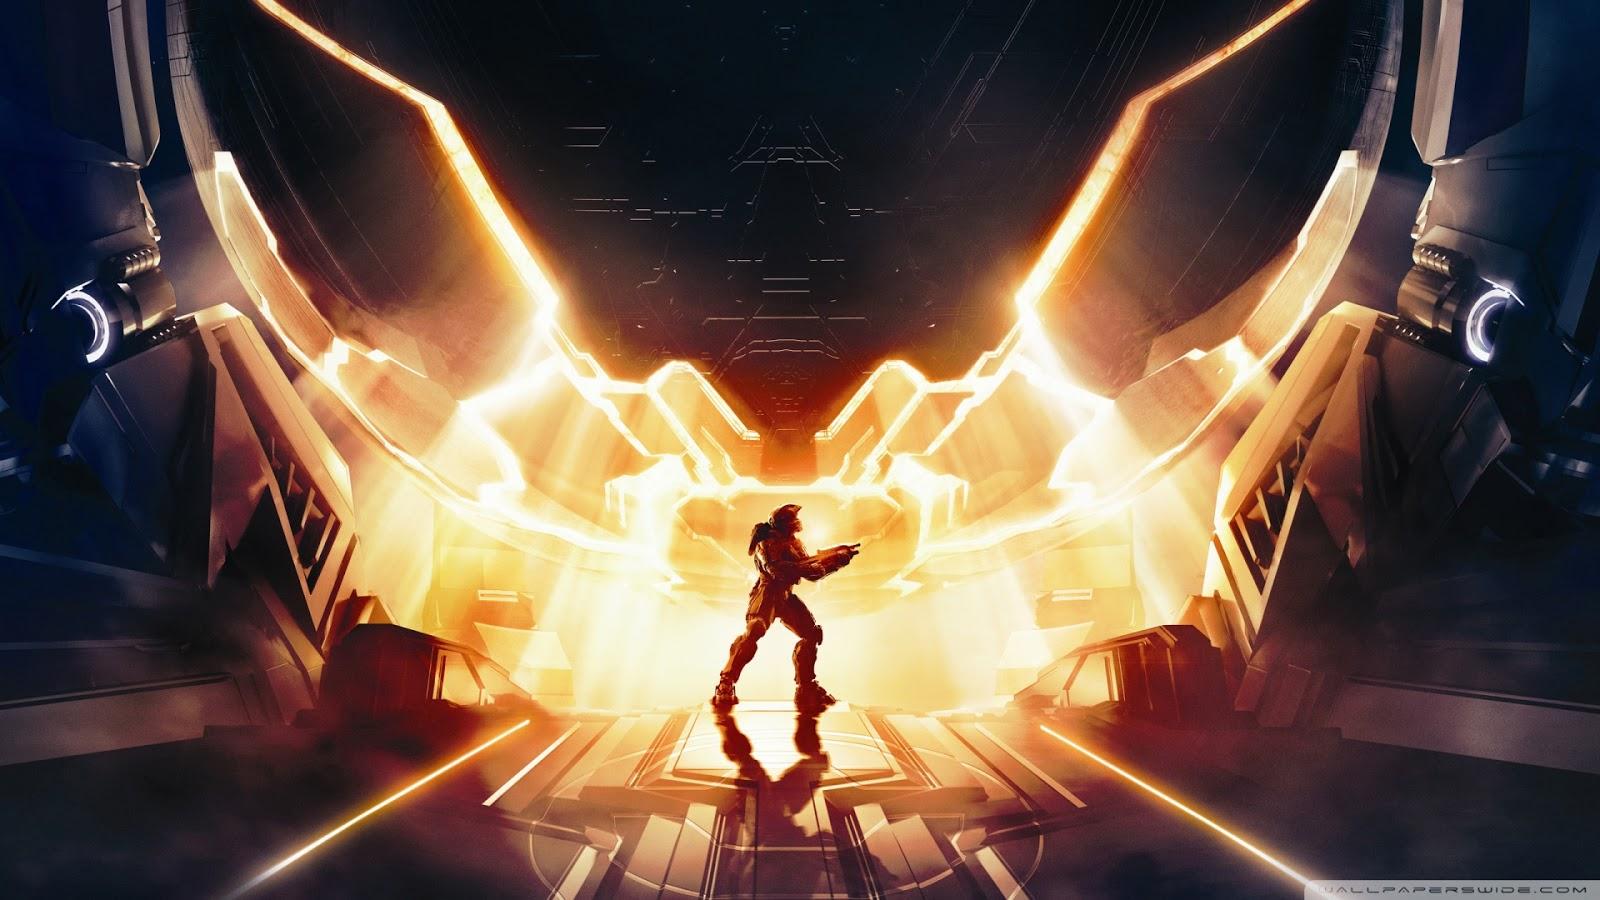 Killzone Shadow Fall 1080p Wallpaper Wallpapers HD: Gamers ...